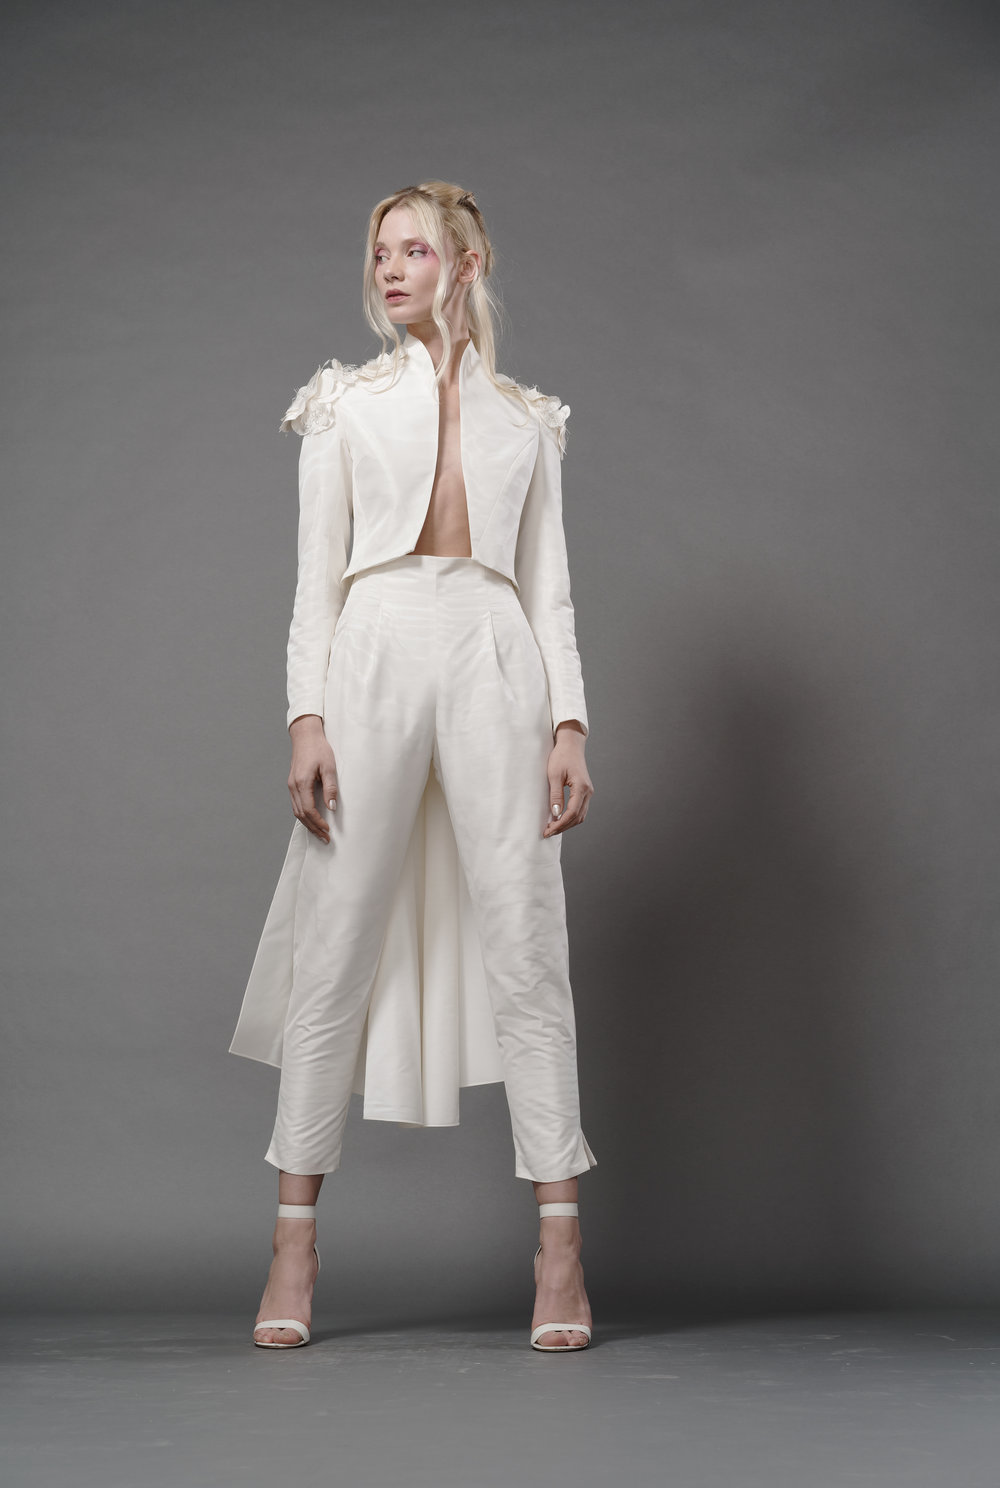 Elizabeth Fillmore Bridal Fall 2019 -  Bowie Rock Star Tail Jacket